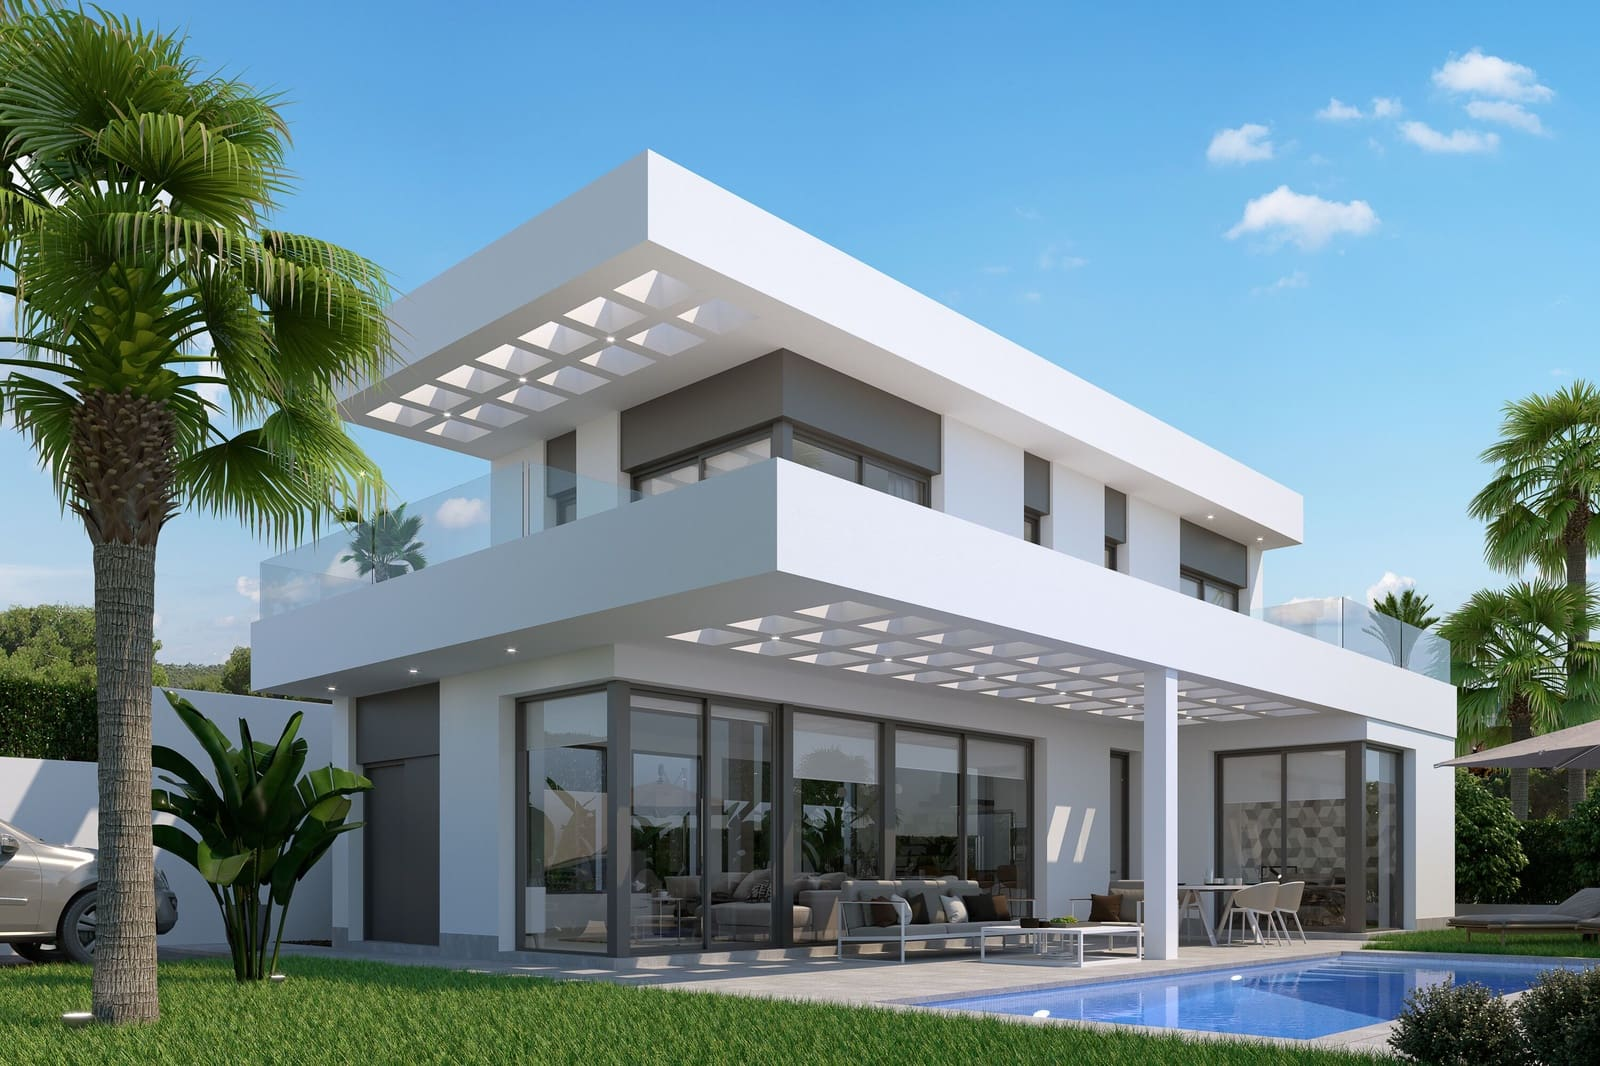 3 bedroom Villa for sale in Cala de Finestrat with pool - € 634,000 (Ref: 5071855)